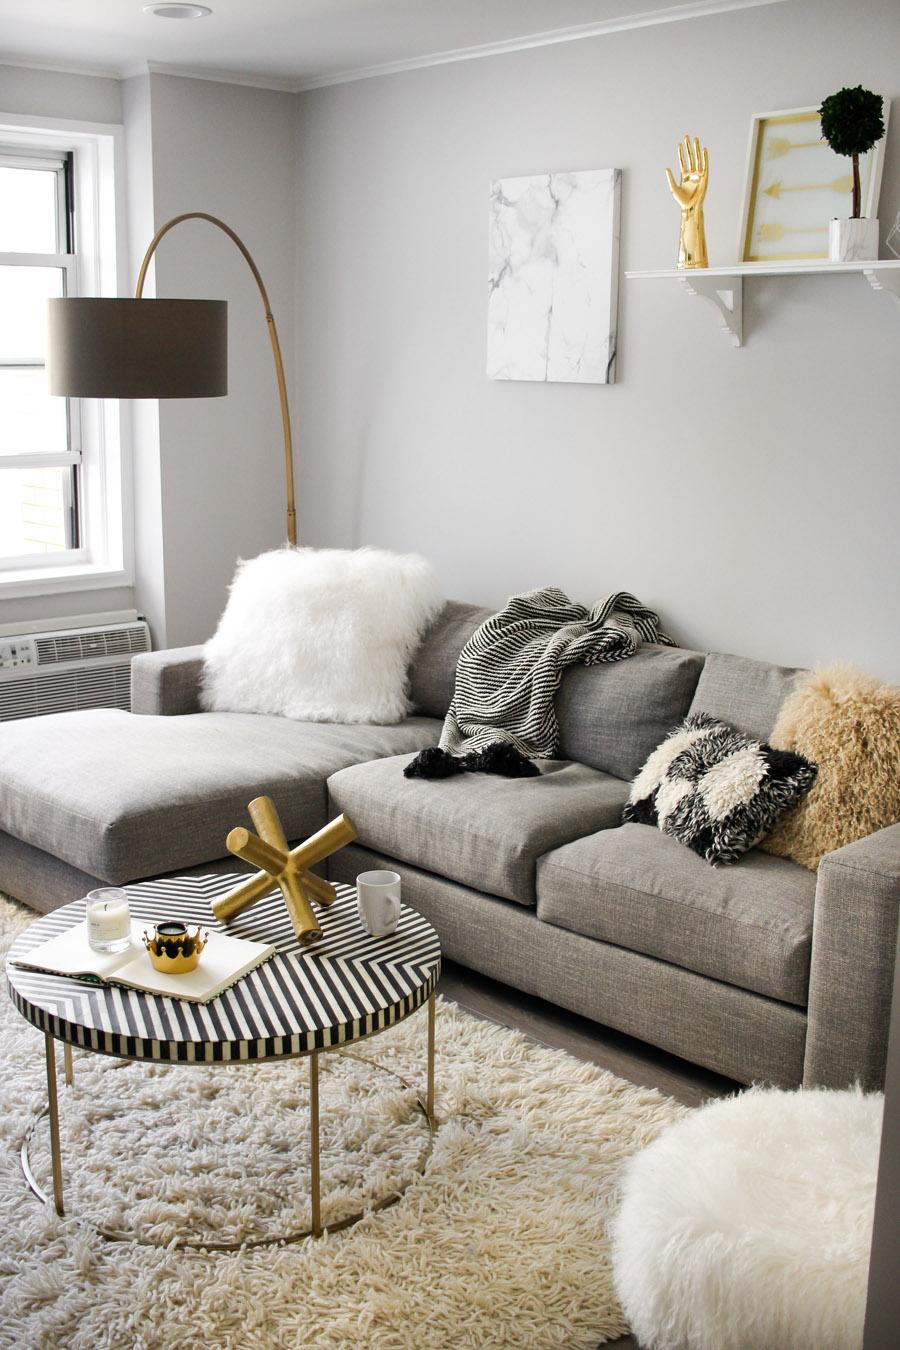 west elm living rooms simple room curtains a modern monochrome front main steffy kuncman s